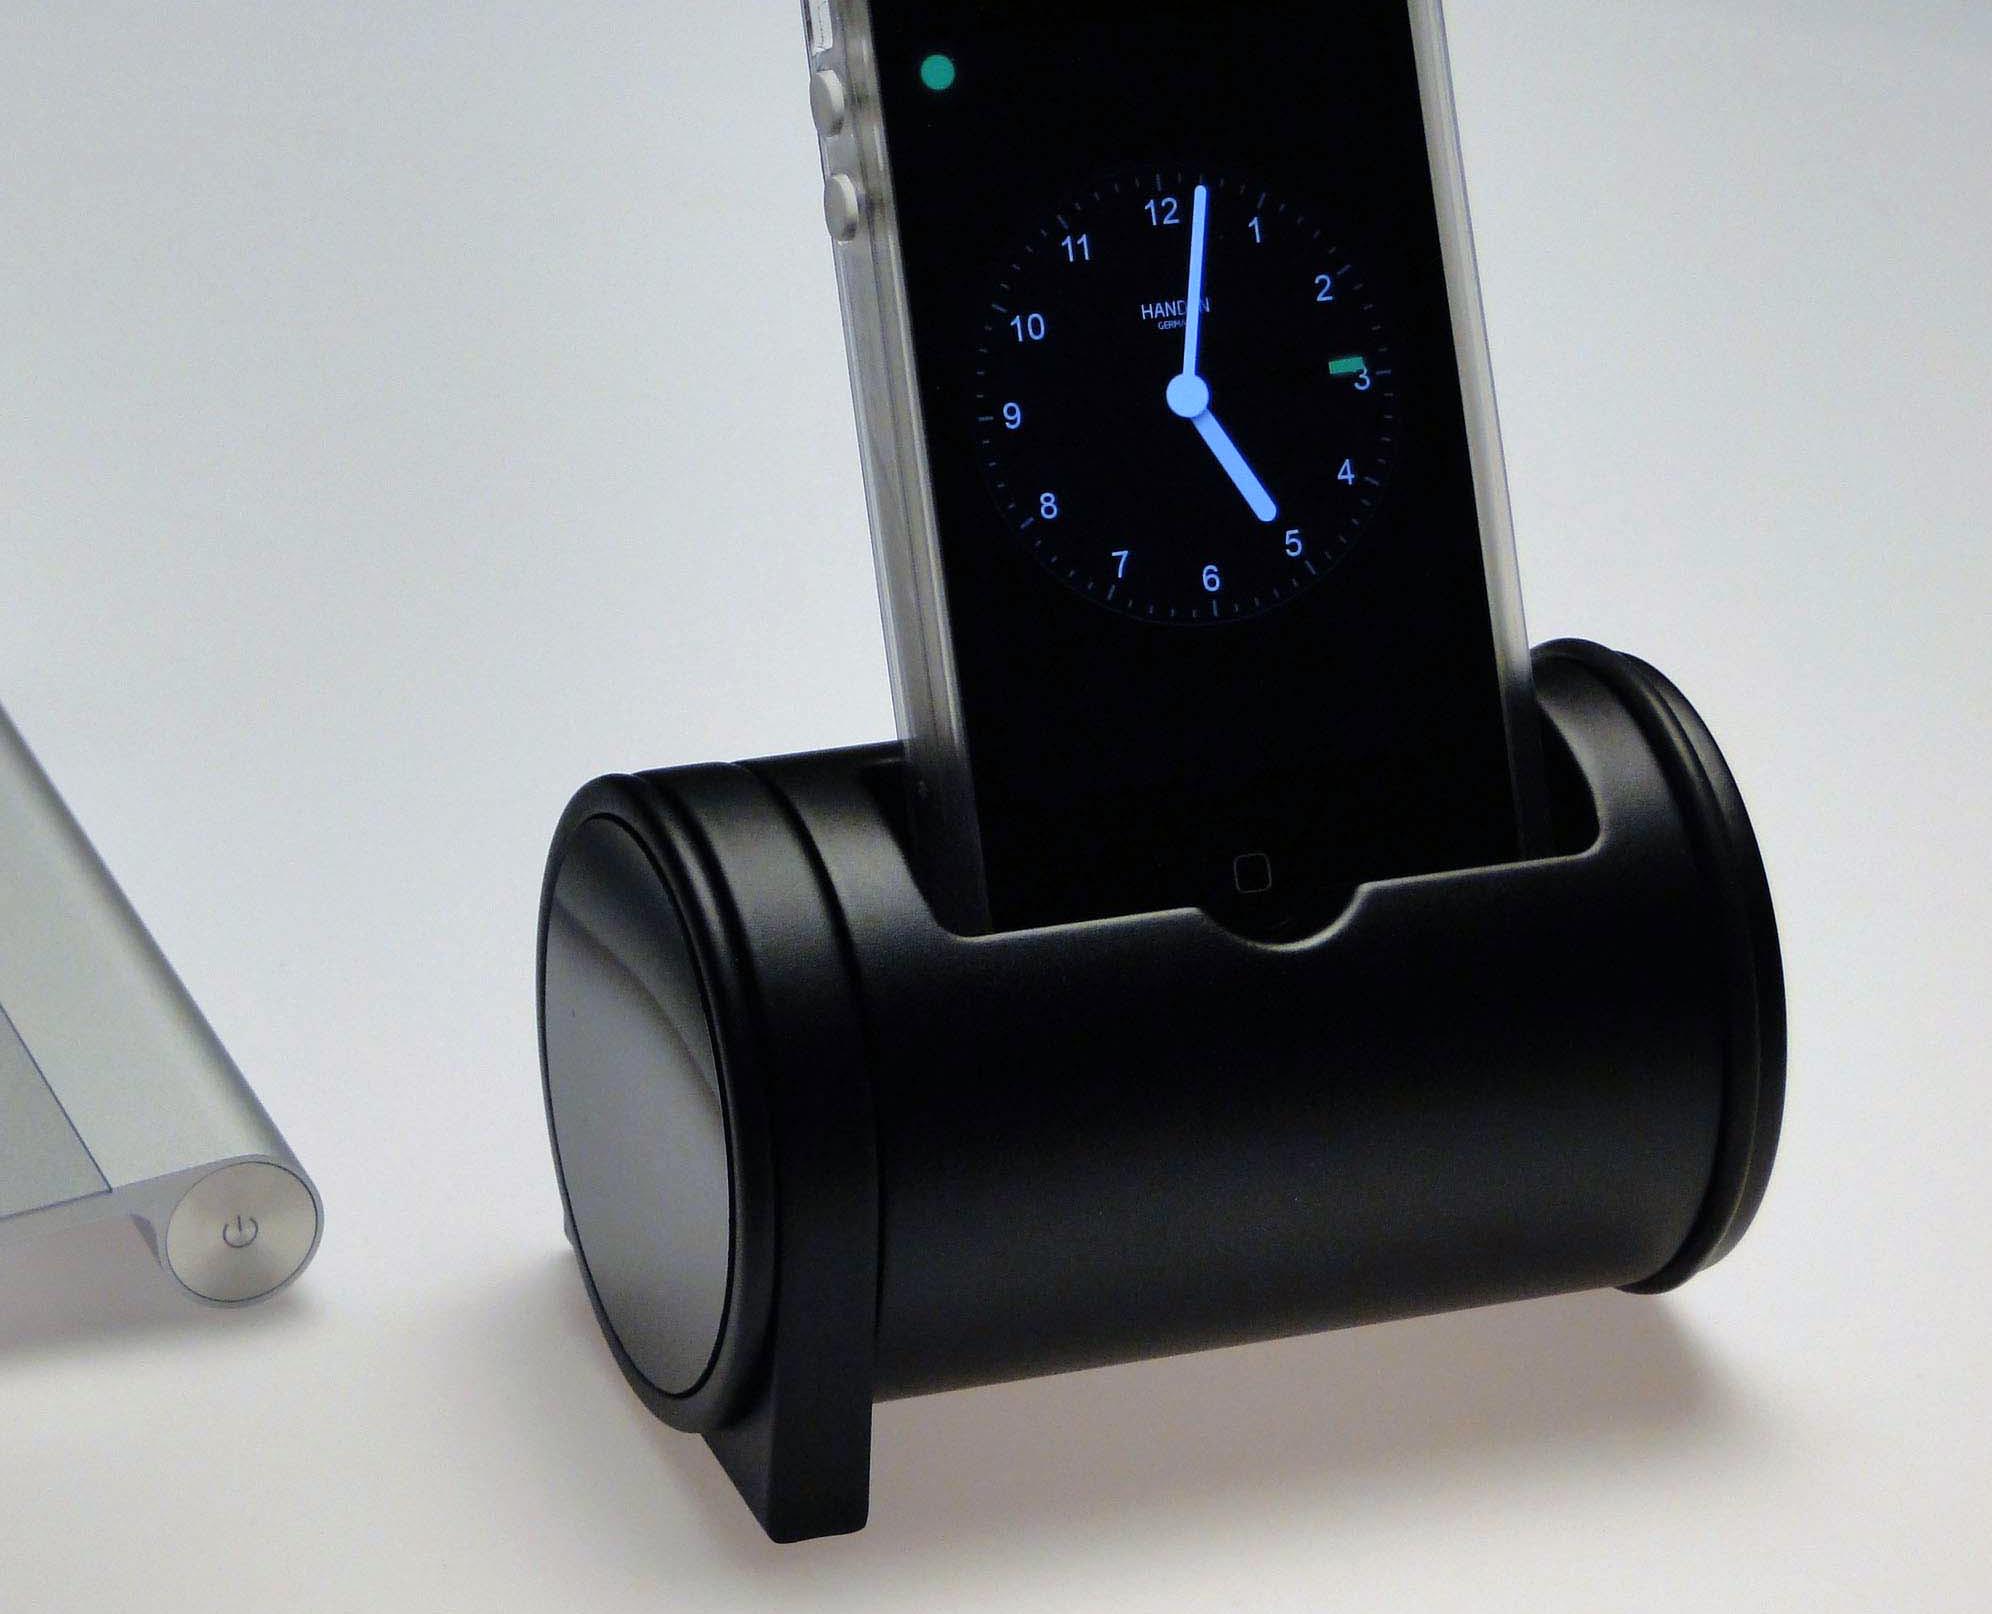 Black ODOC with black iPhone